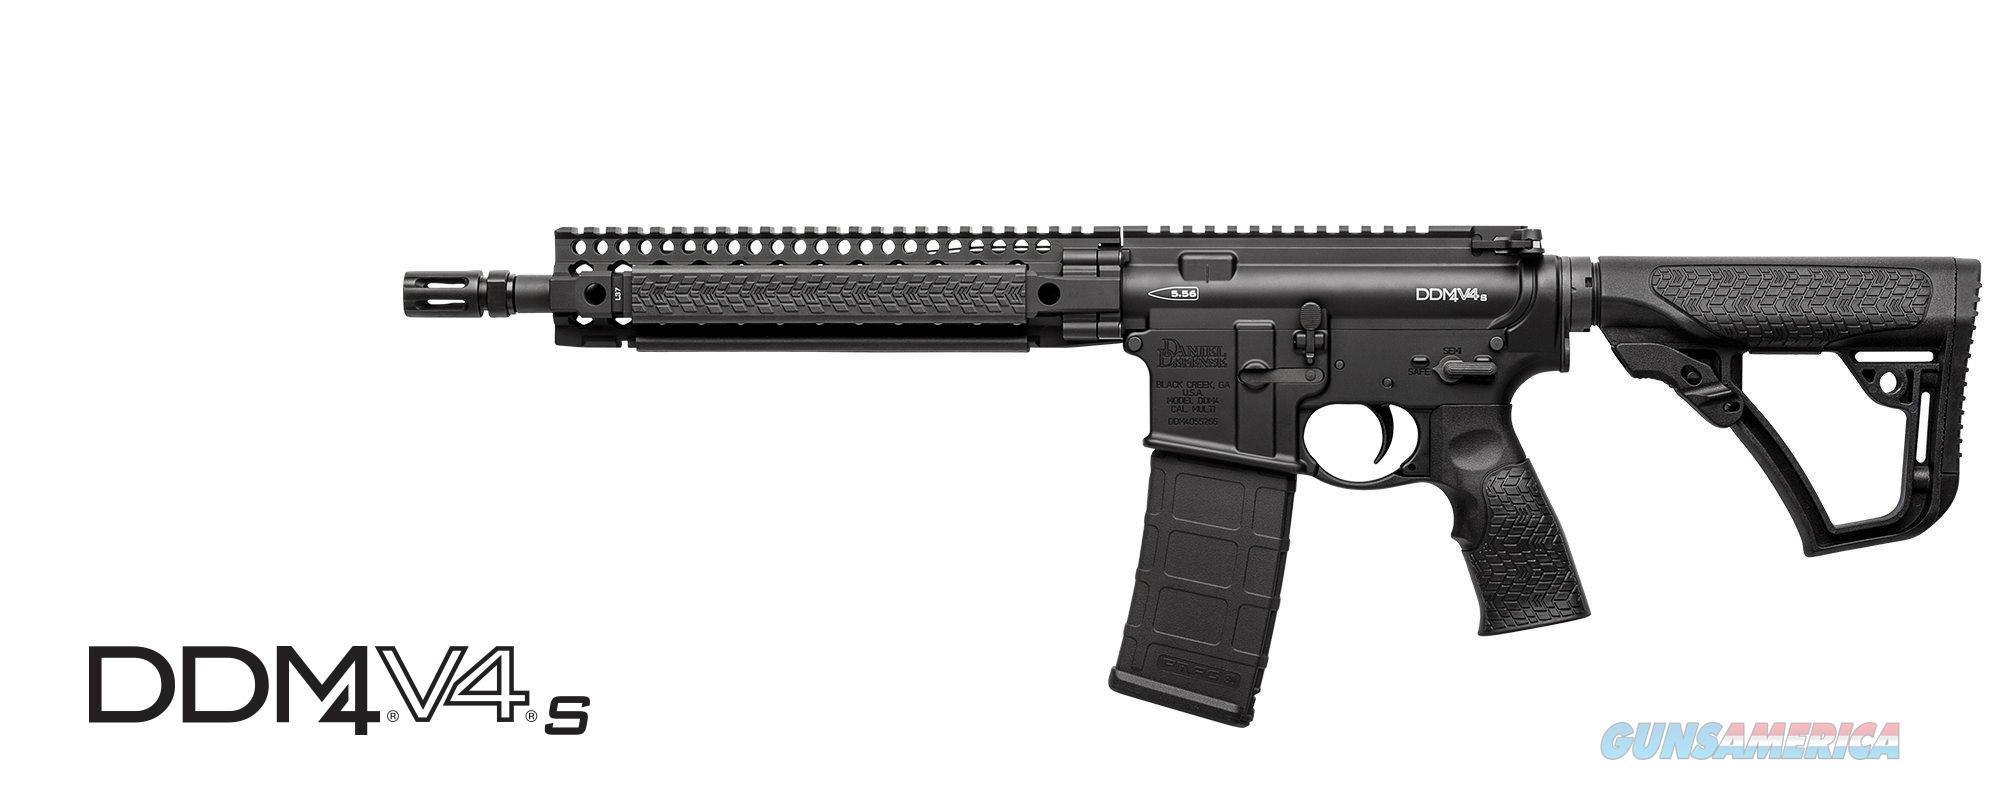 "Daniel Defense DDM4 V4 S 5.56 NATO SBR 11.5"" AR-15 02-088-11034   Guns > Rifles > Class 3 Rifles > Class 3 Subguns"